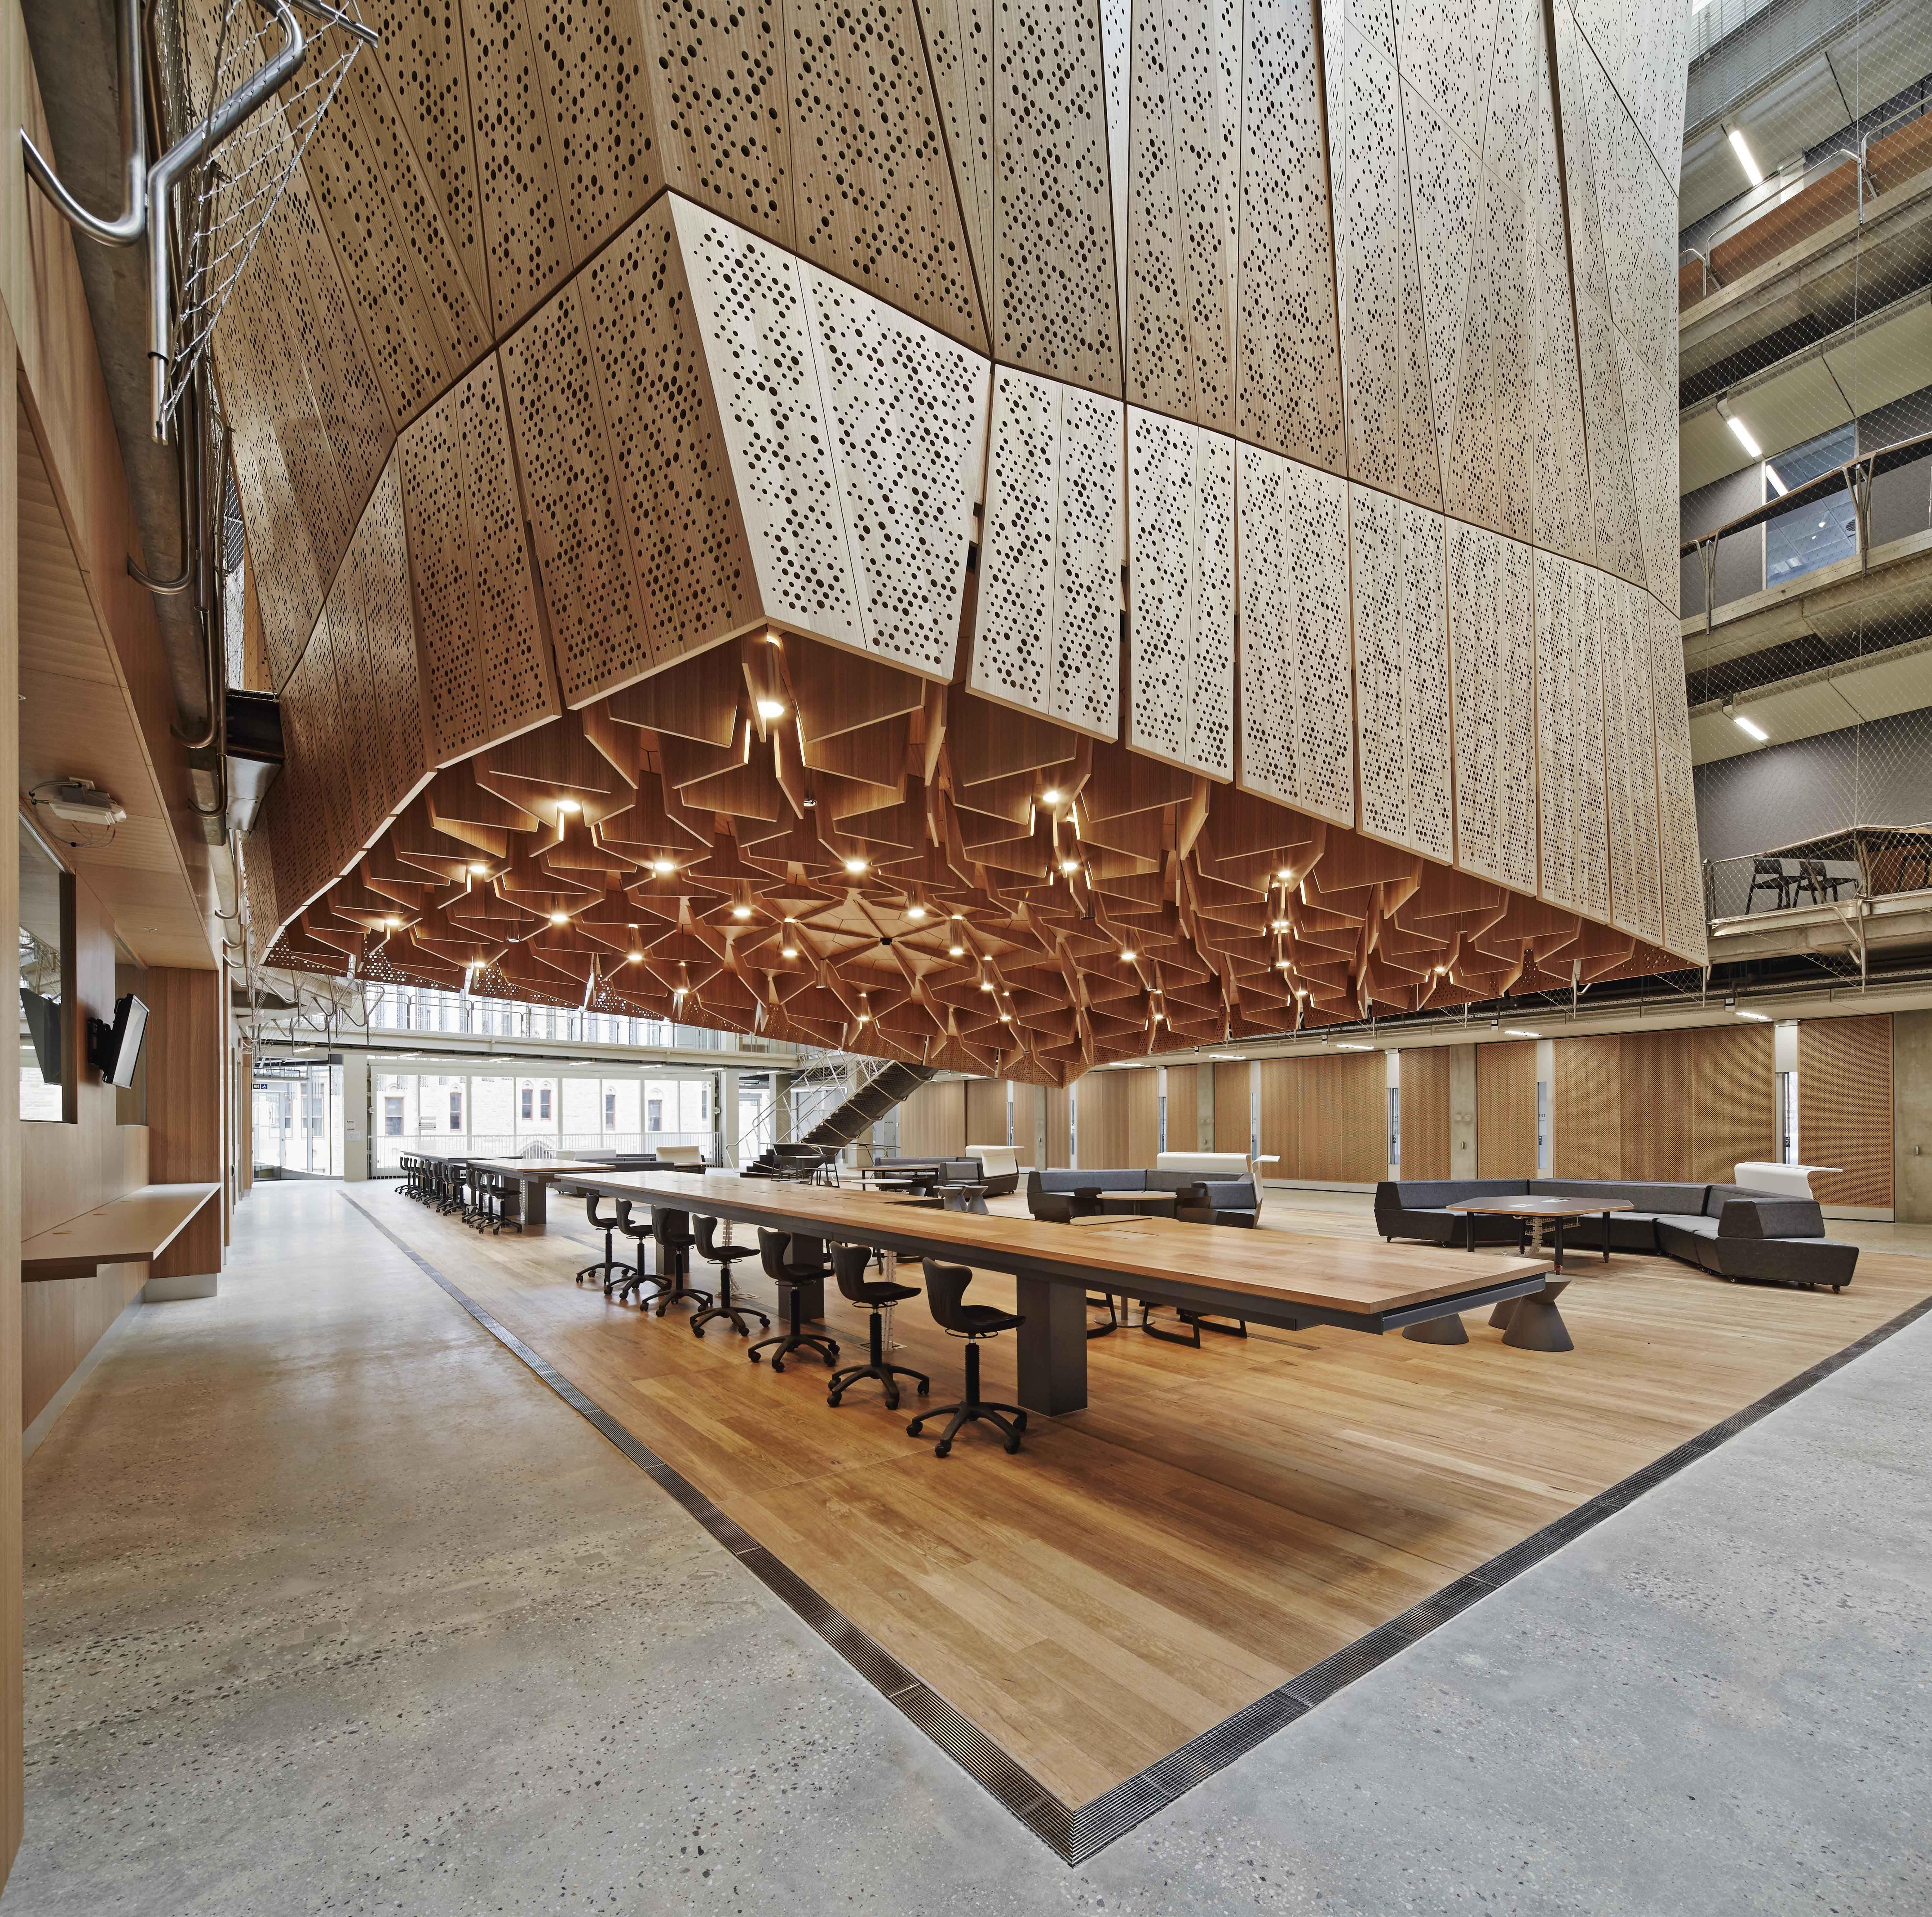 Melbourne School Of Design With Images Australian Interior